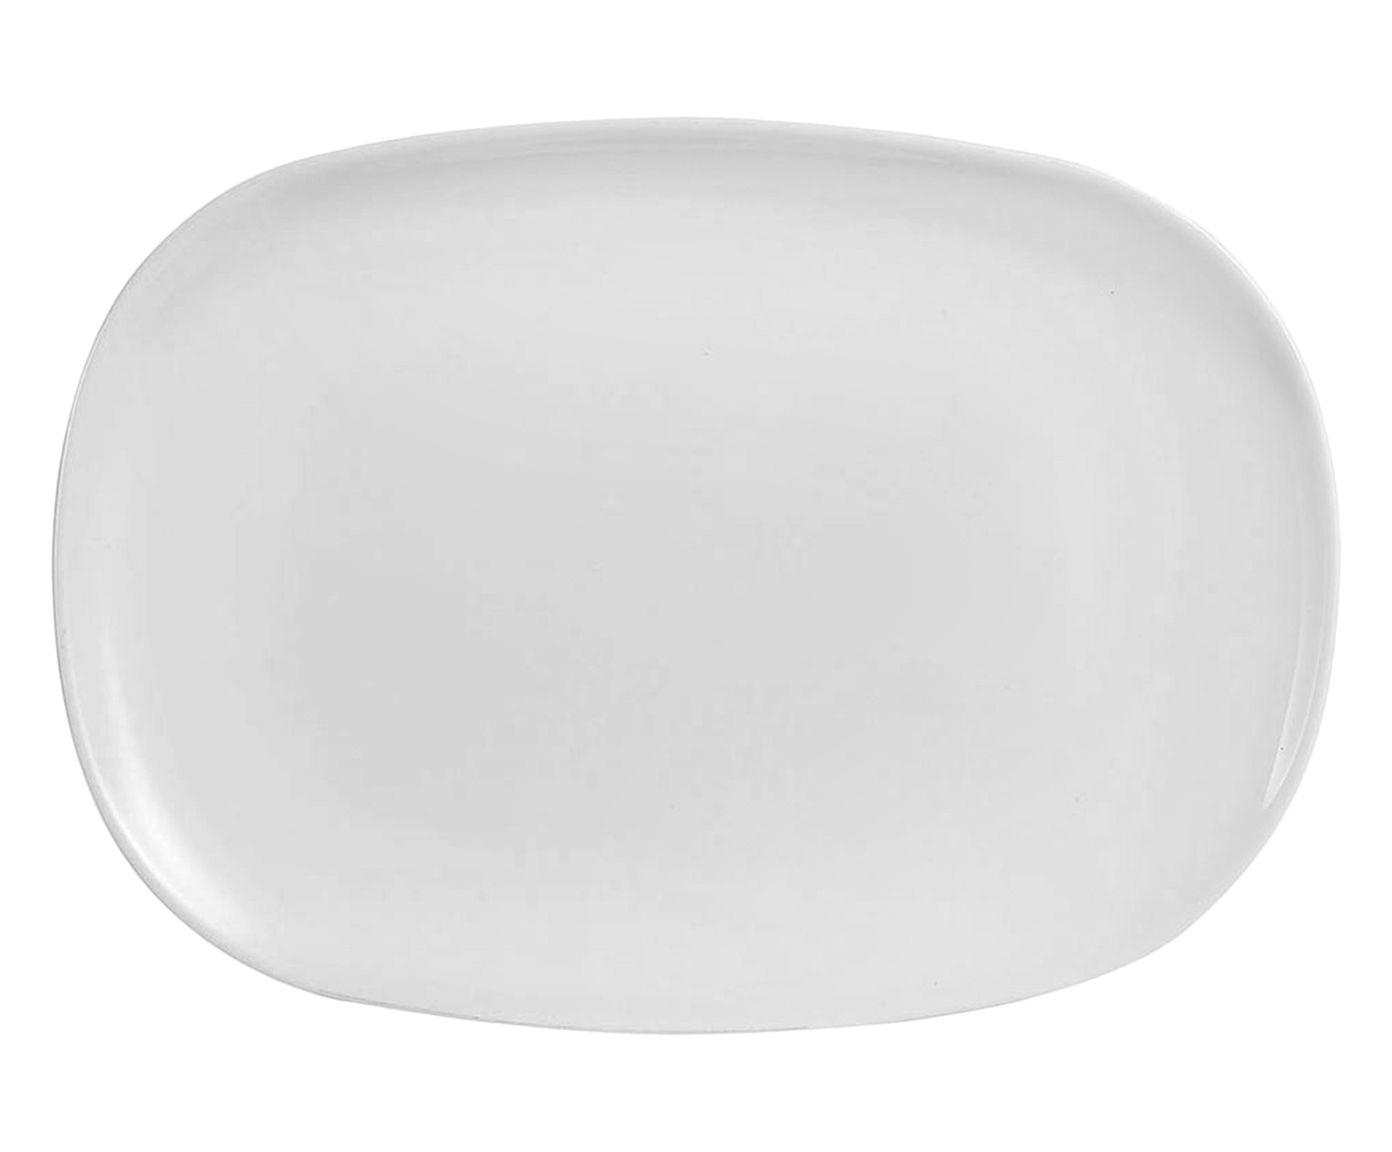 Prato para Servir Sweet Branco - 35X24cm | Westwing.com.br